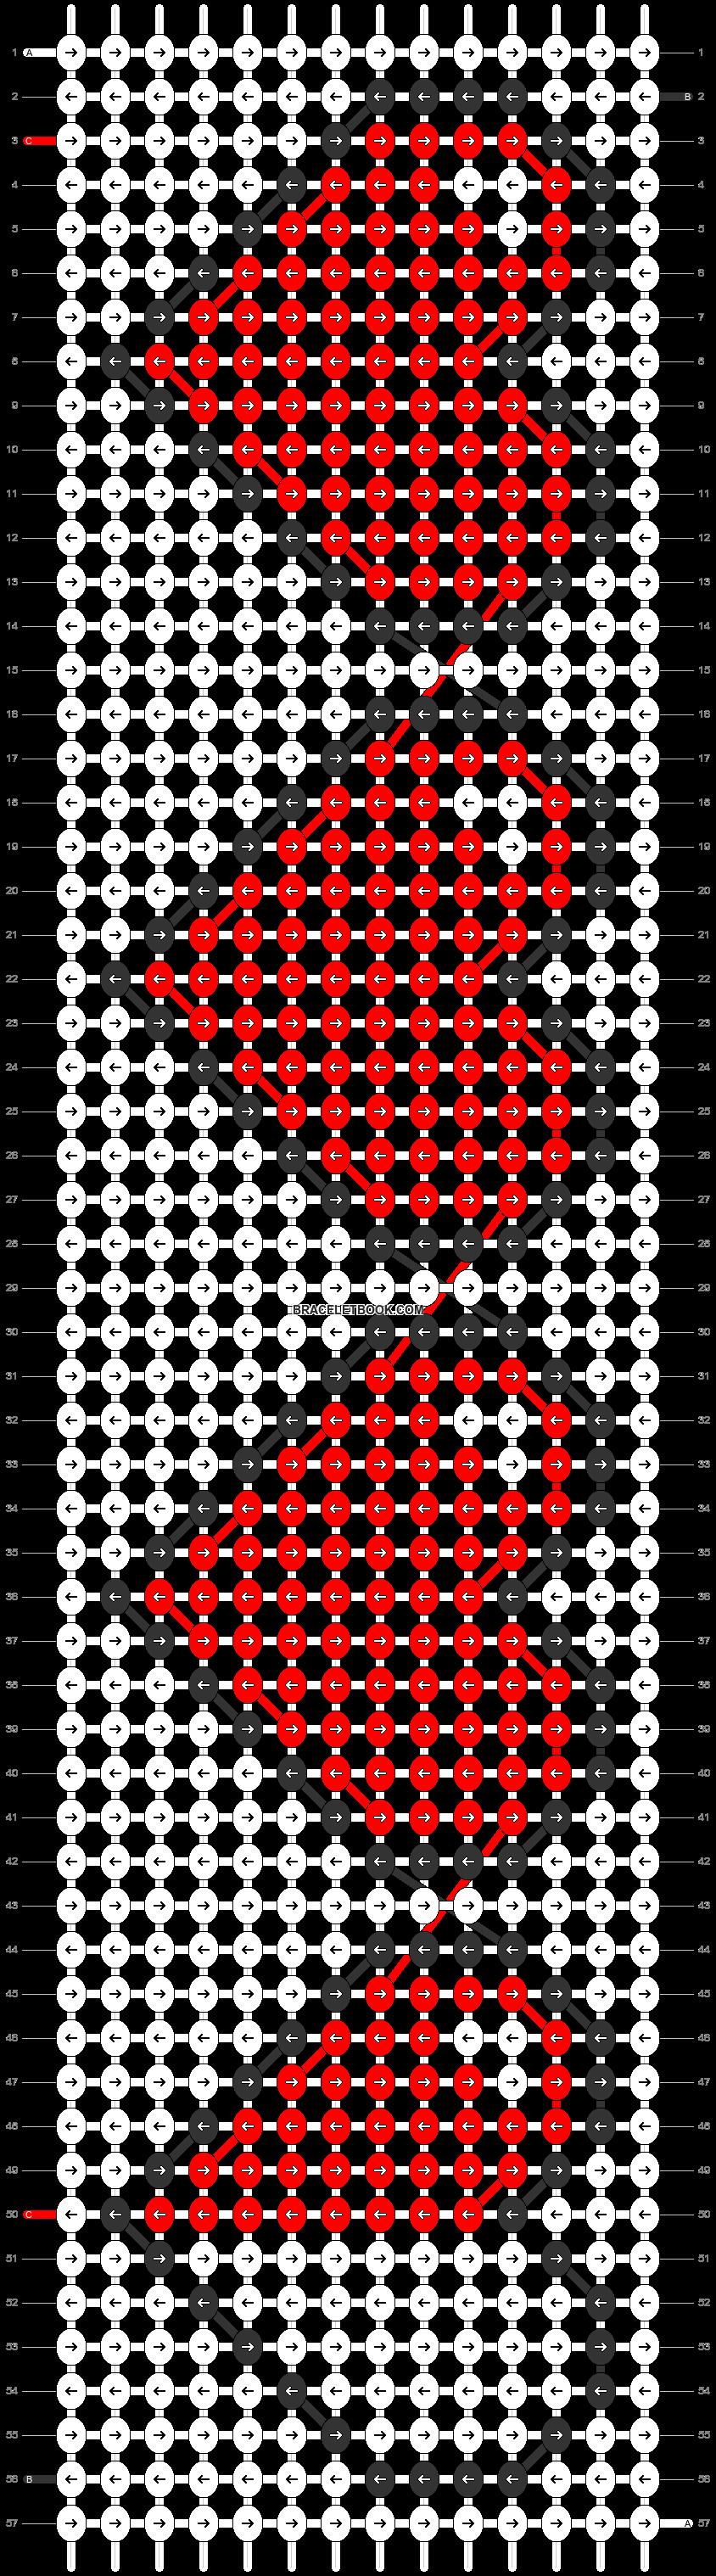 Alpha Pattern #4495 added by Chestnut